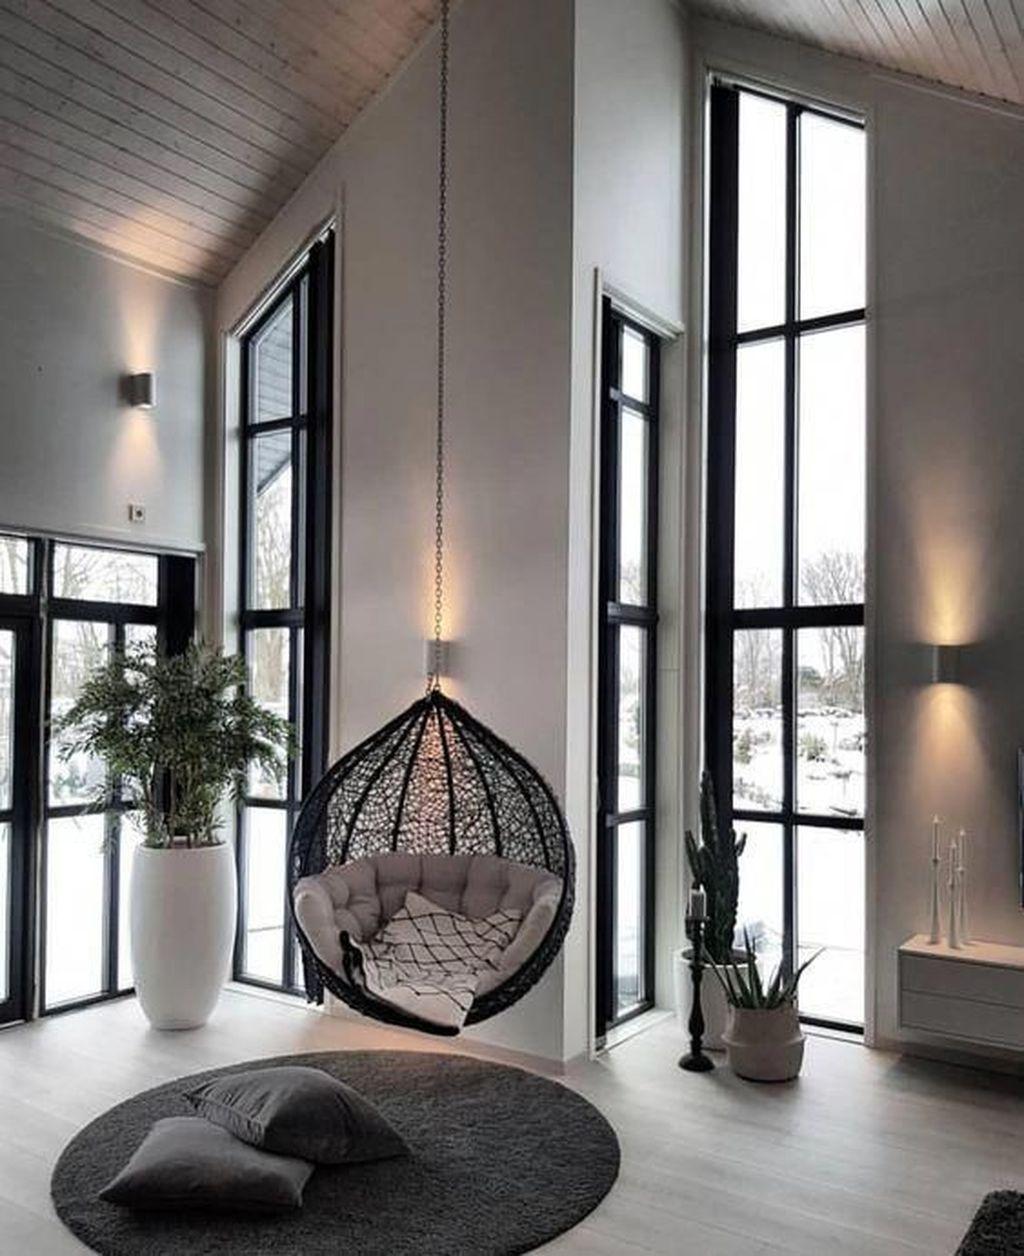 Admirable Modern Interior Design Ideas You Never Seen Before 08